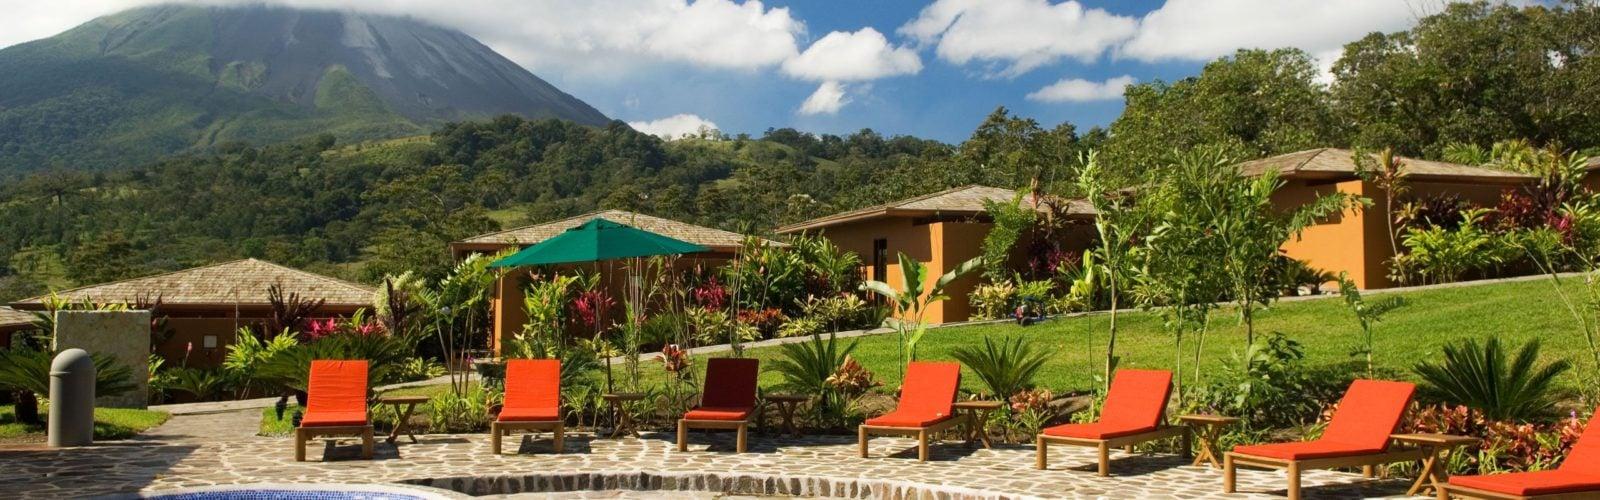 The pool at Nayara Hotel and Gardens, Arenal, Costa Rica